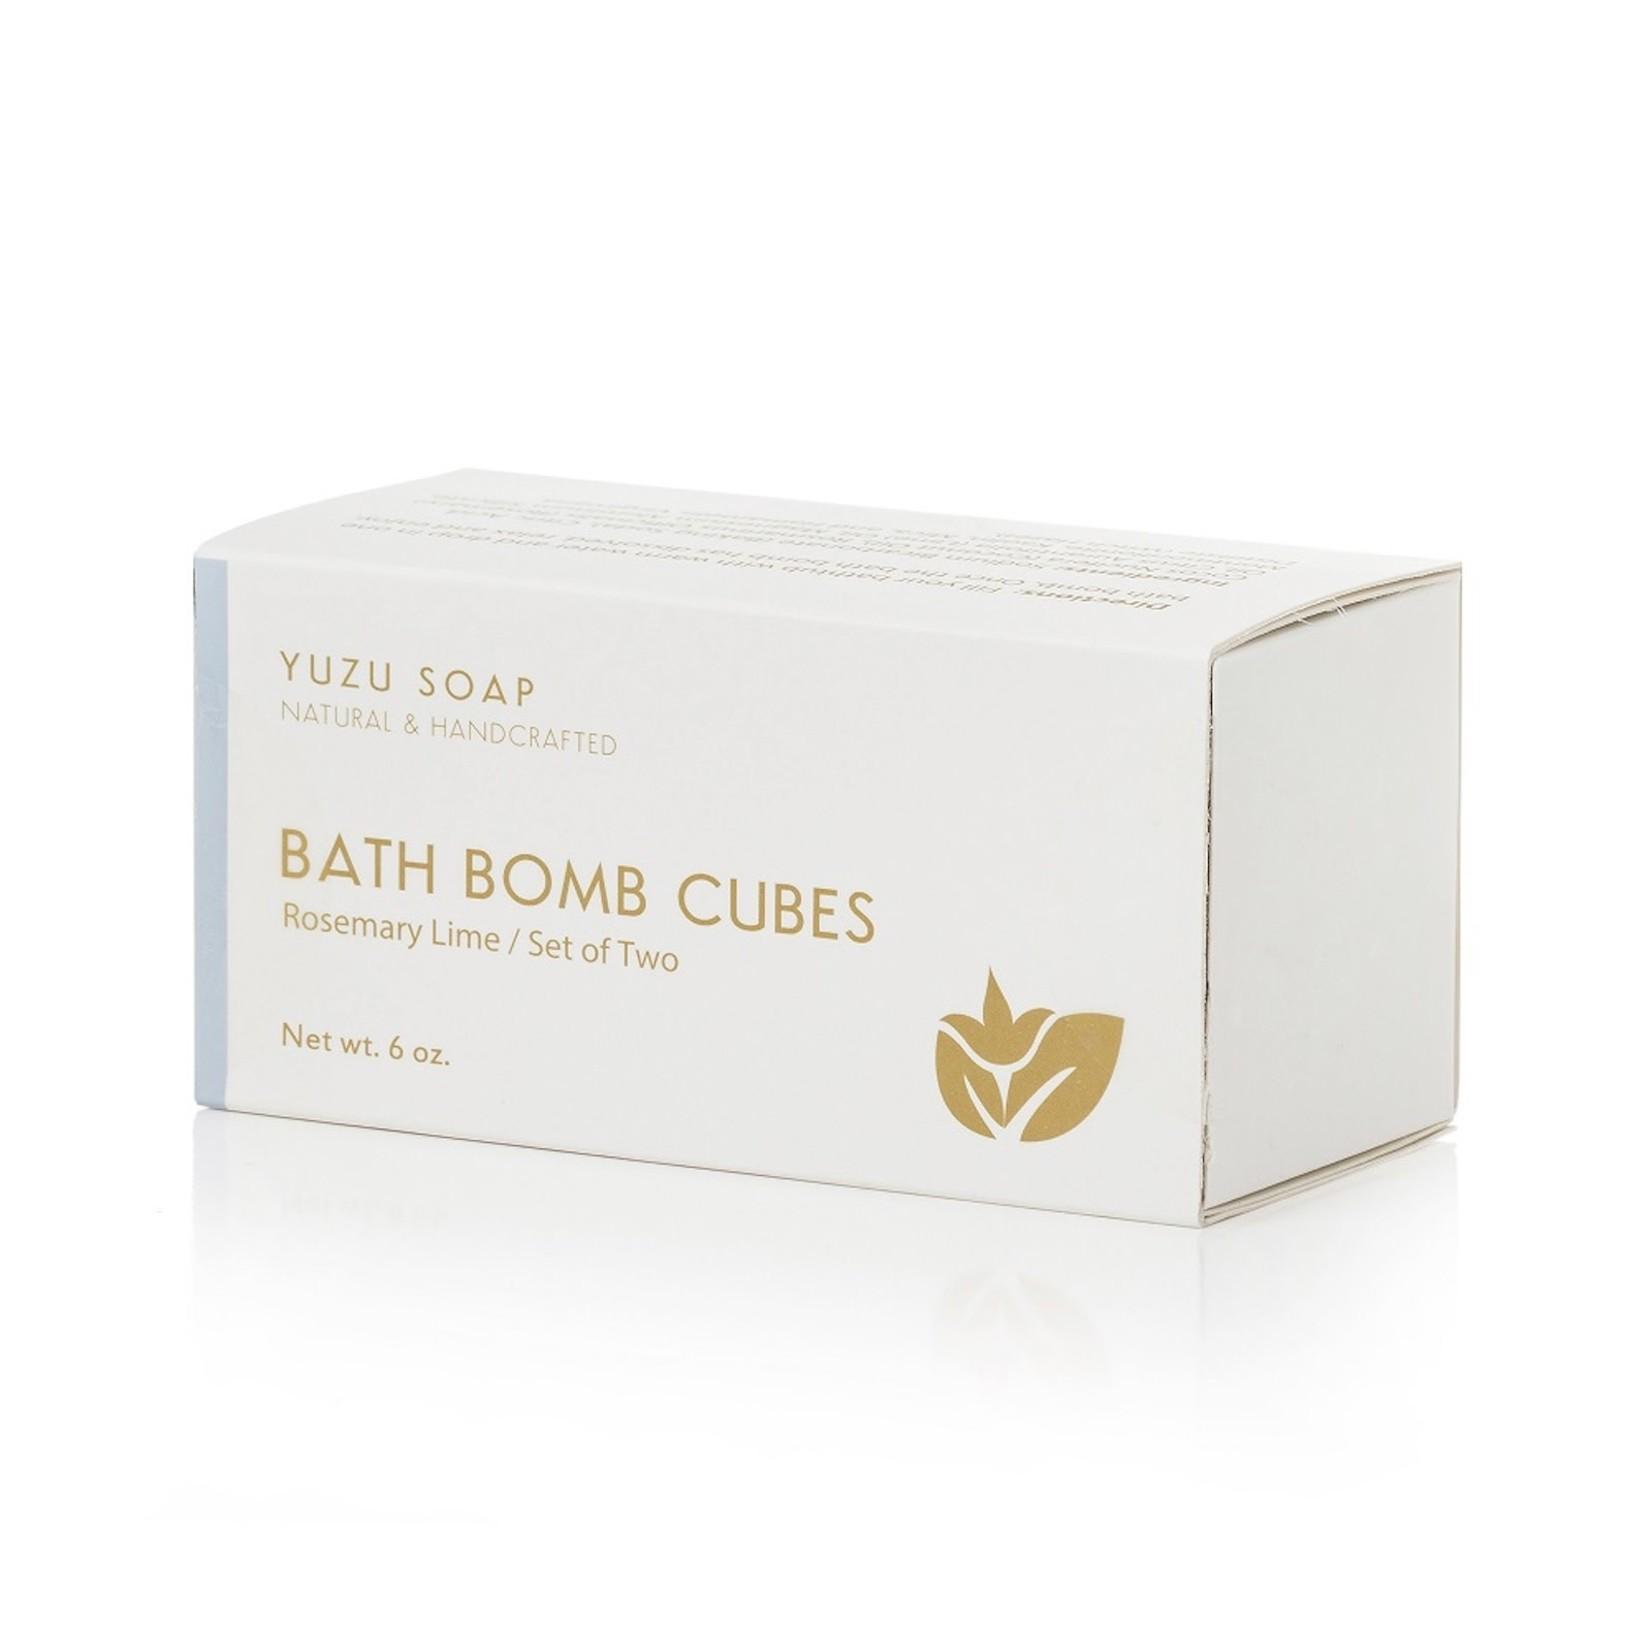 Rosemary Lime Bath Bomb Cubes